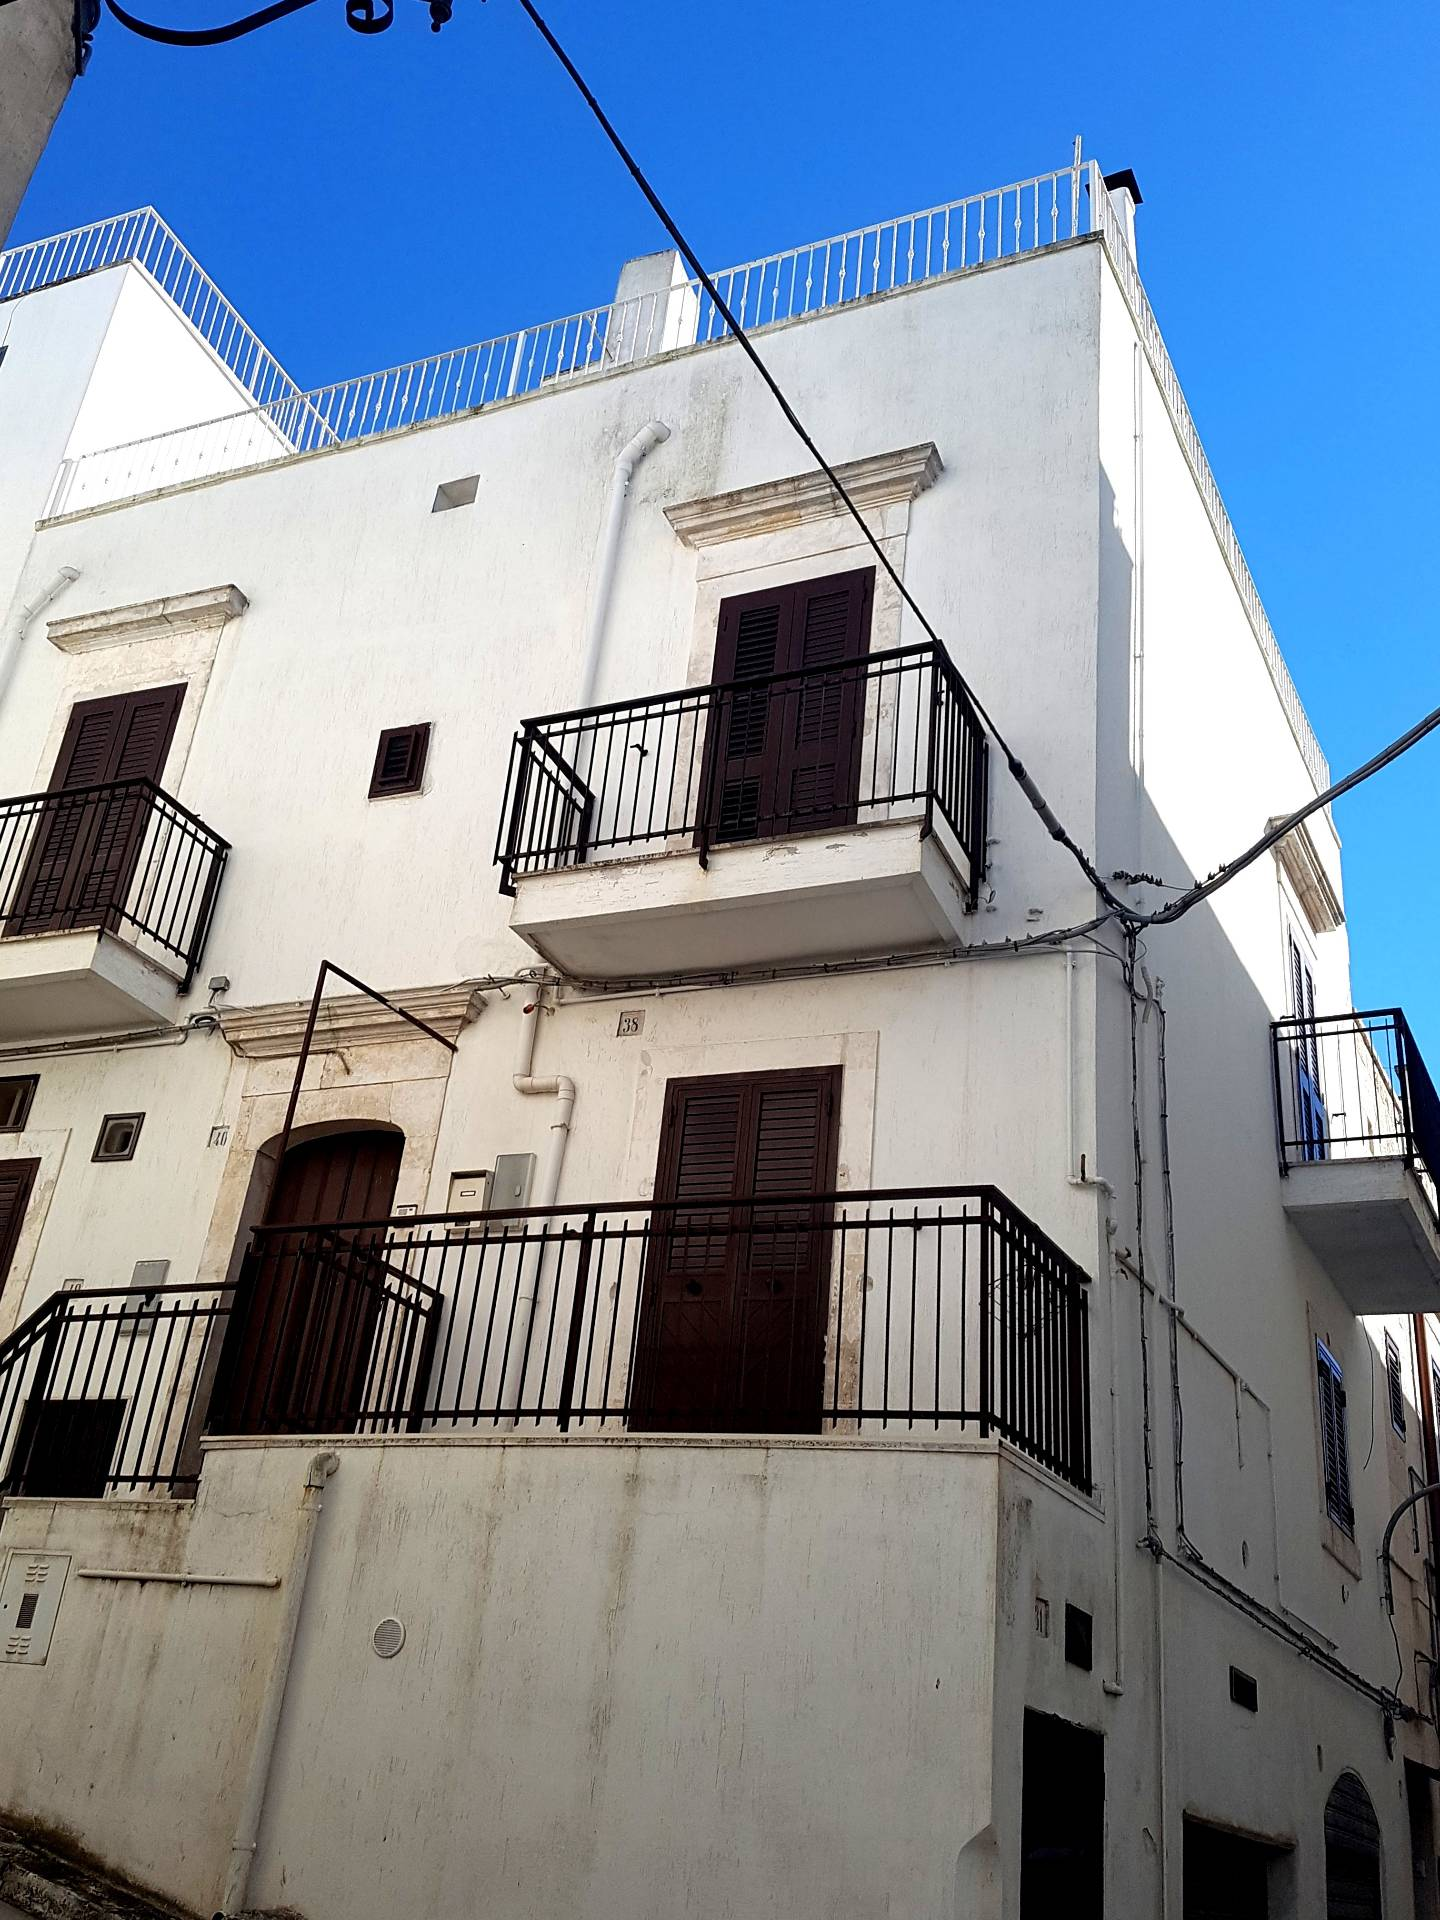 Soluzione Indipendente in vendita a Ostuni, 5 locali, Trattative riservate | Cambio Casa.it